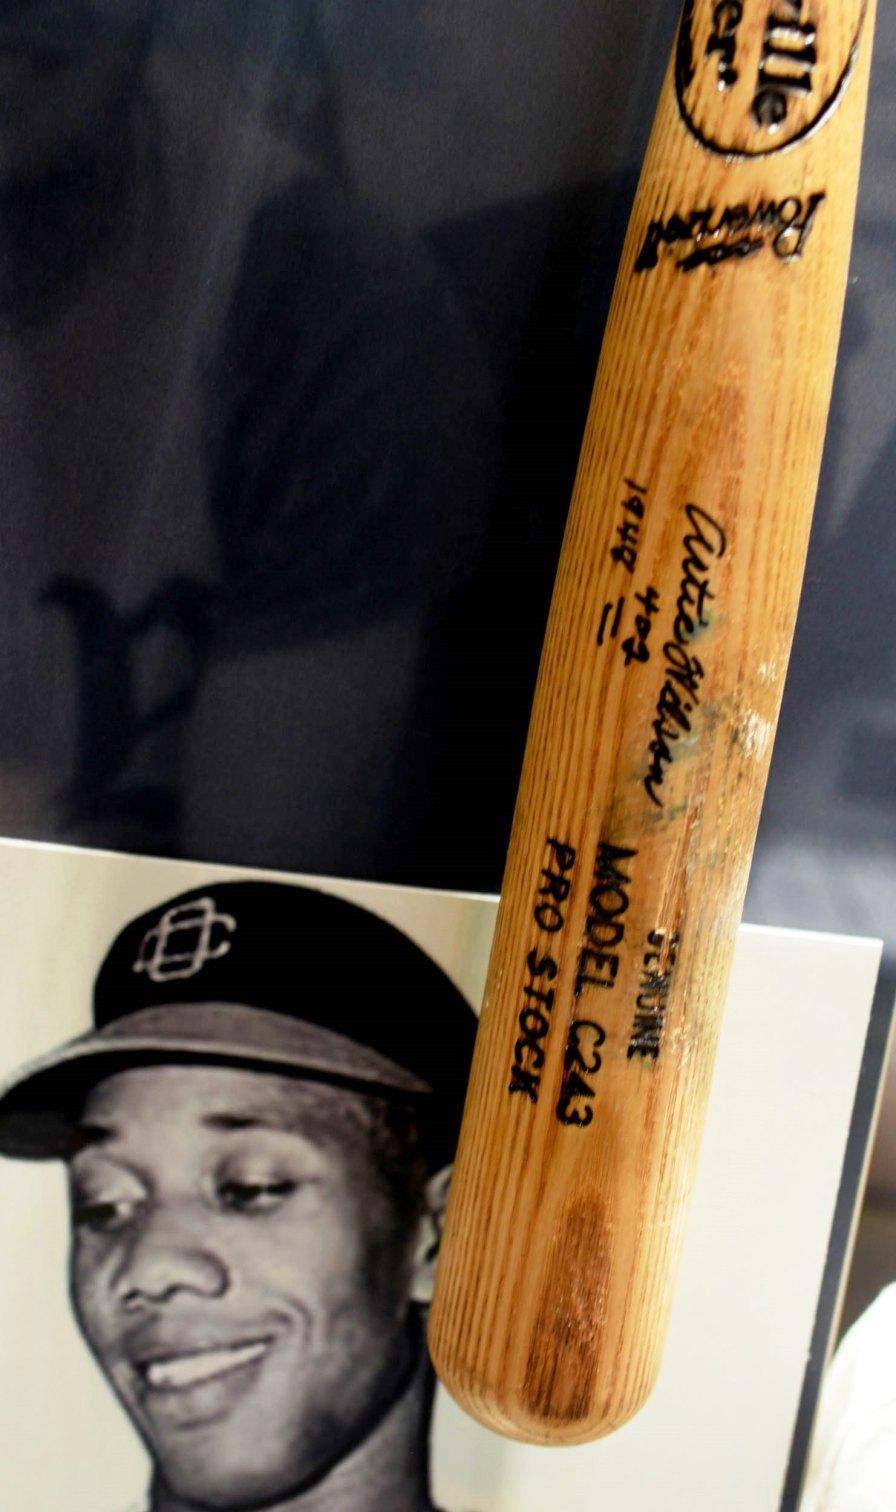 Artie Wilson figures prominently in the Negro Southern League Museum in Birmingham. (Solomon Crenshaw Jr. / Alabama NewsCenter)